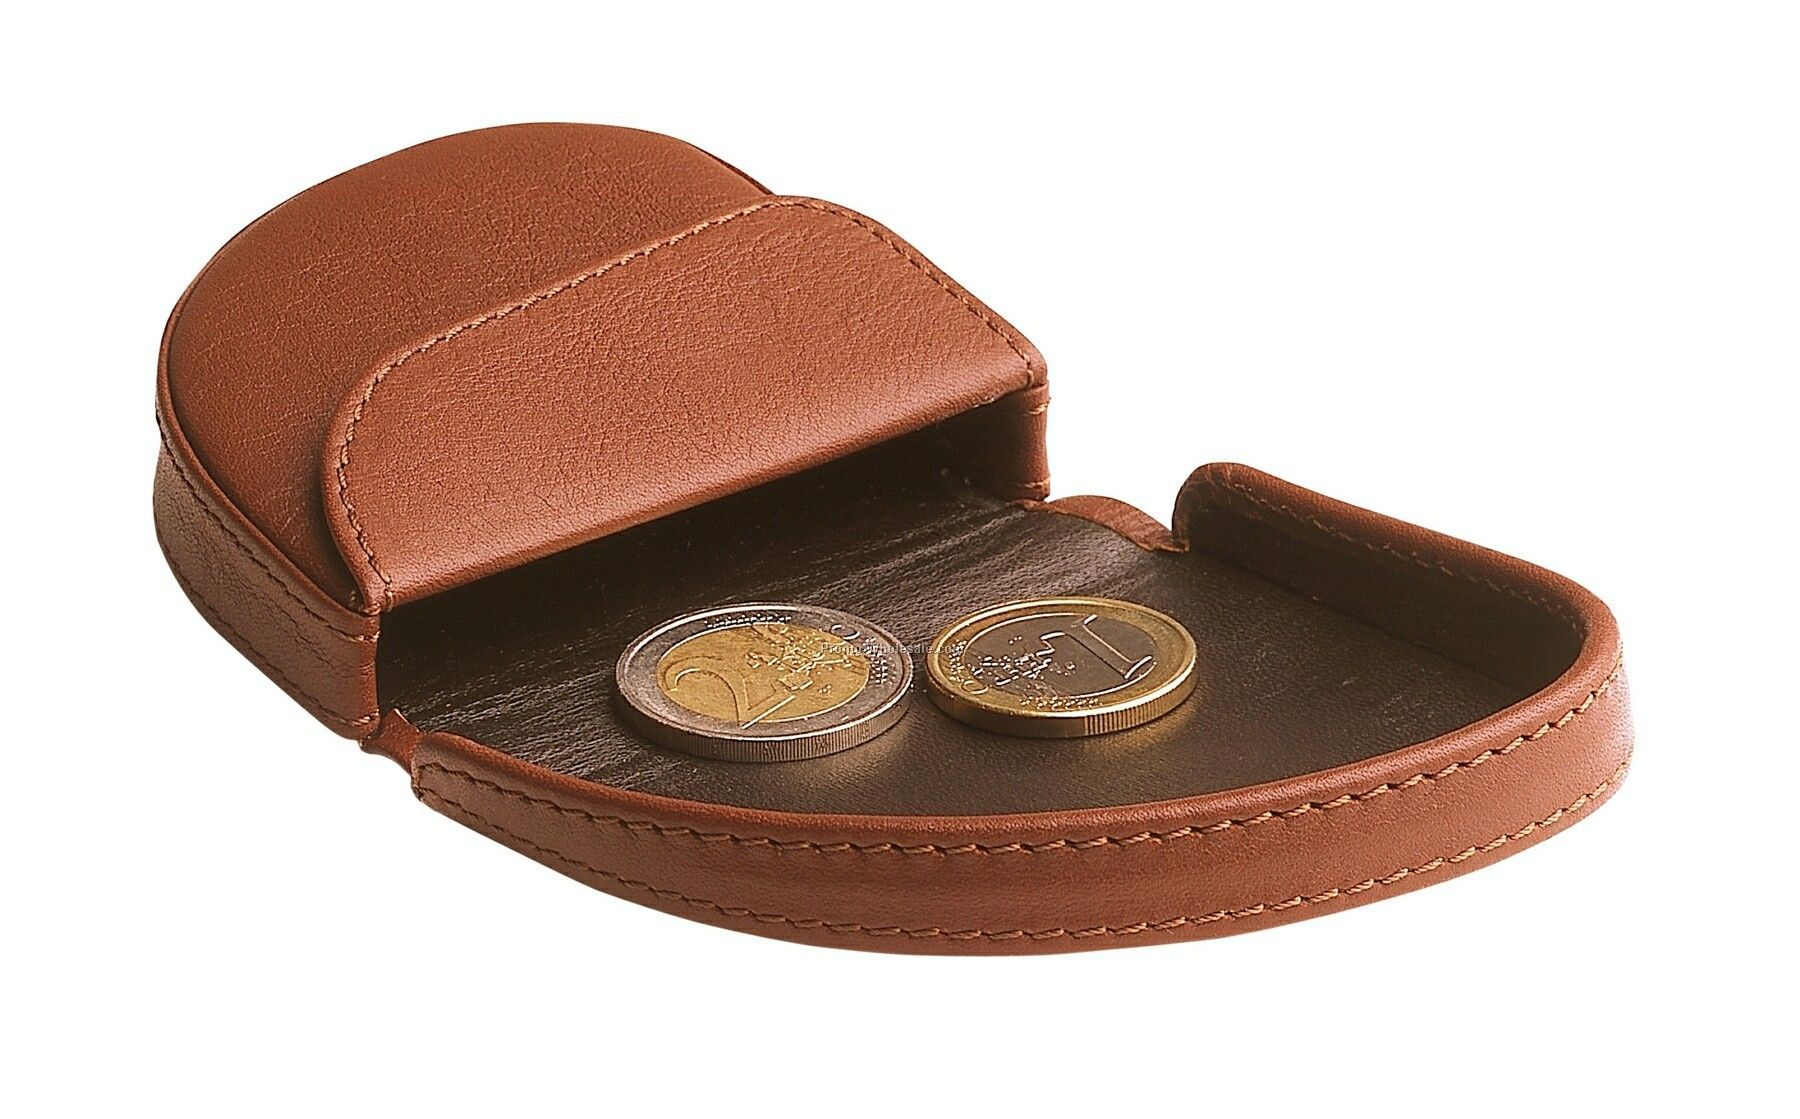 Pocket Leather North Pocket Purse